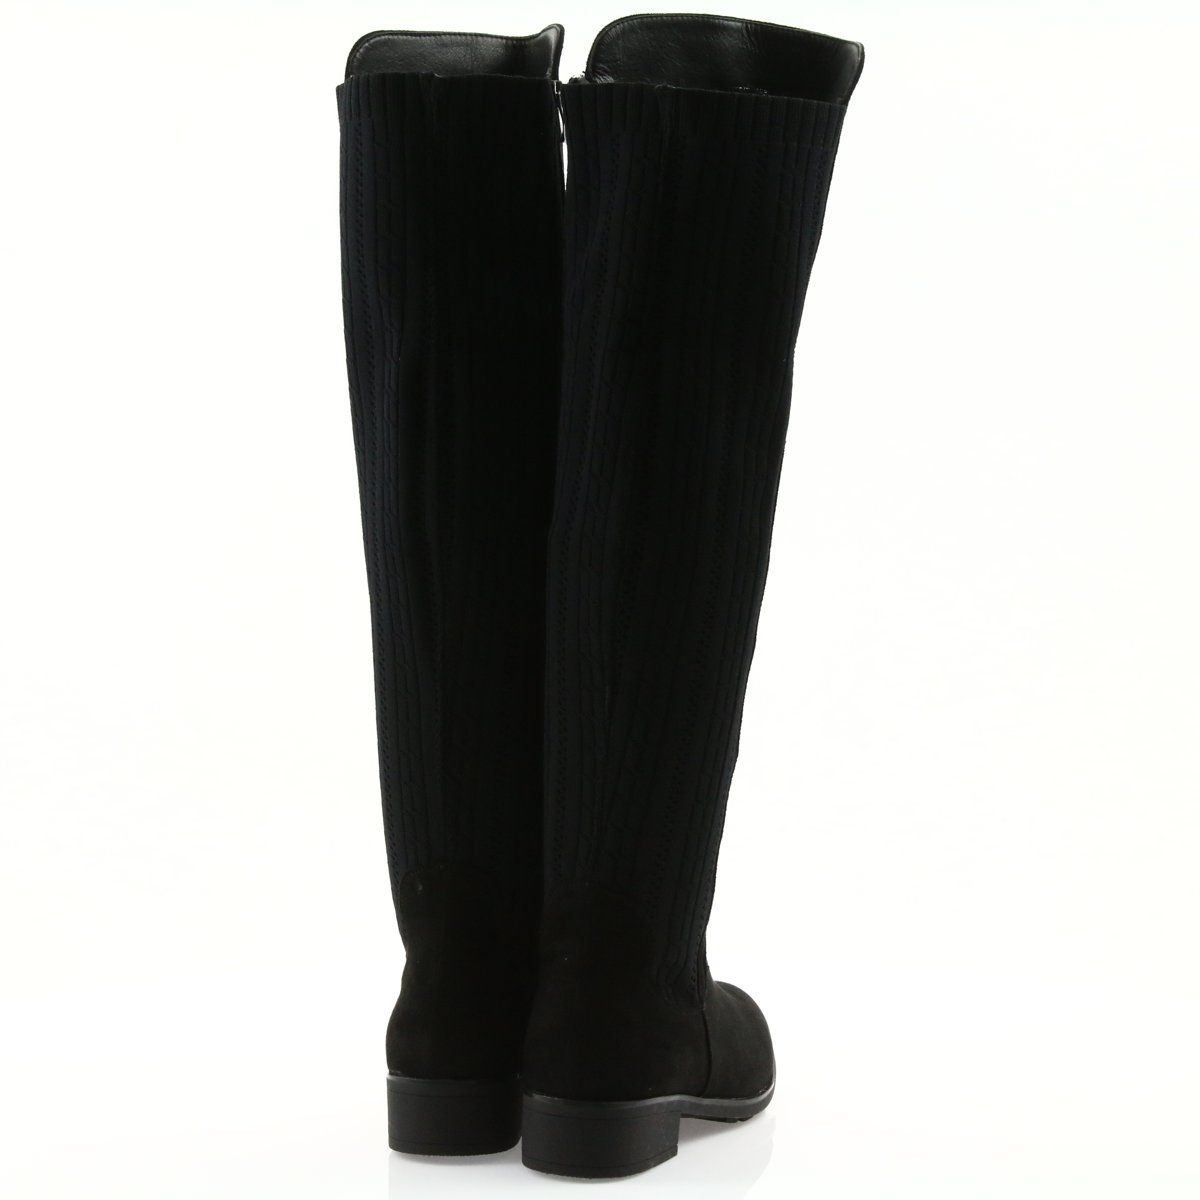 Kozaki Ze Skarpeta Filippo Czarne Boots Insulated Boots Womens Boots